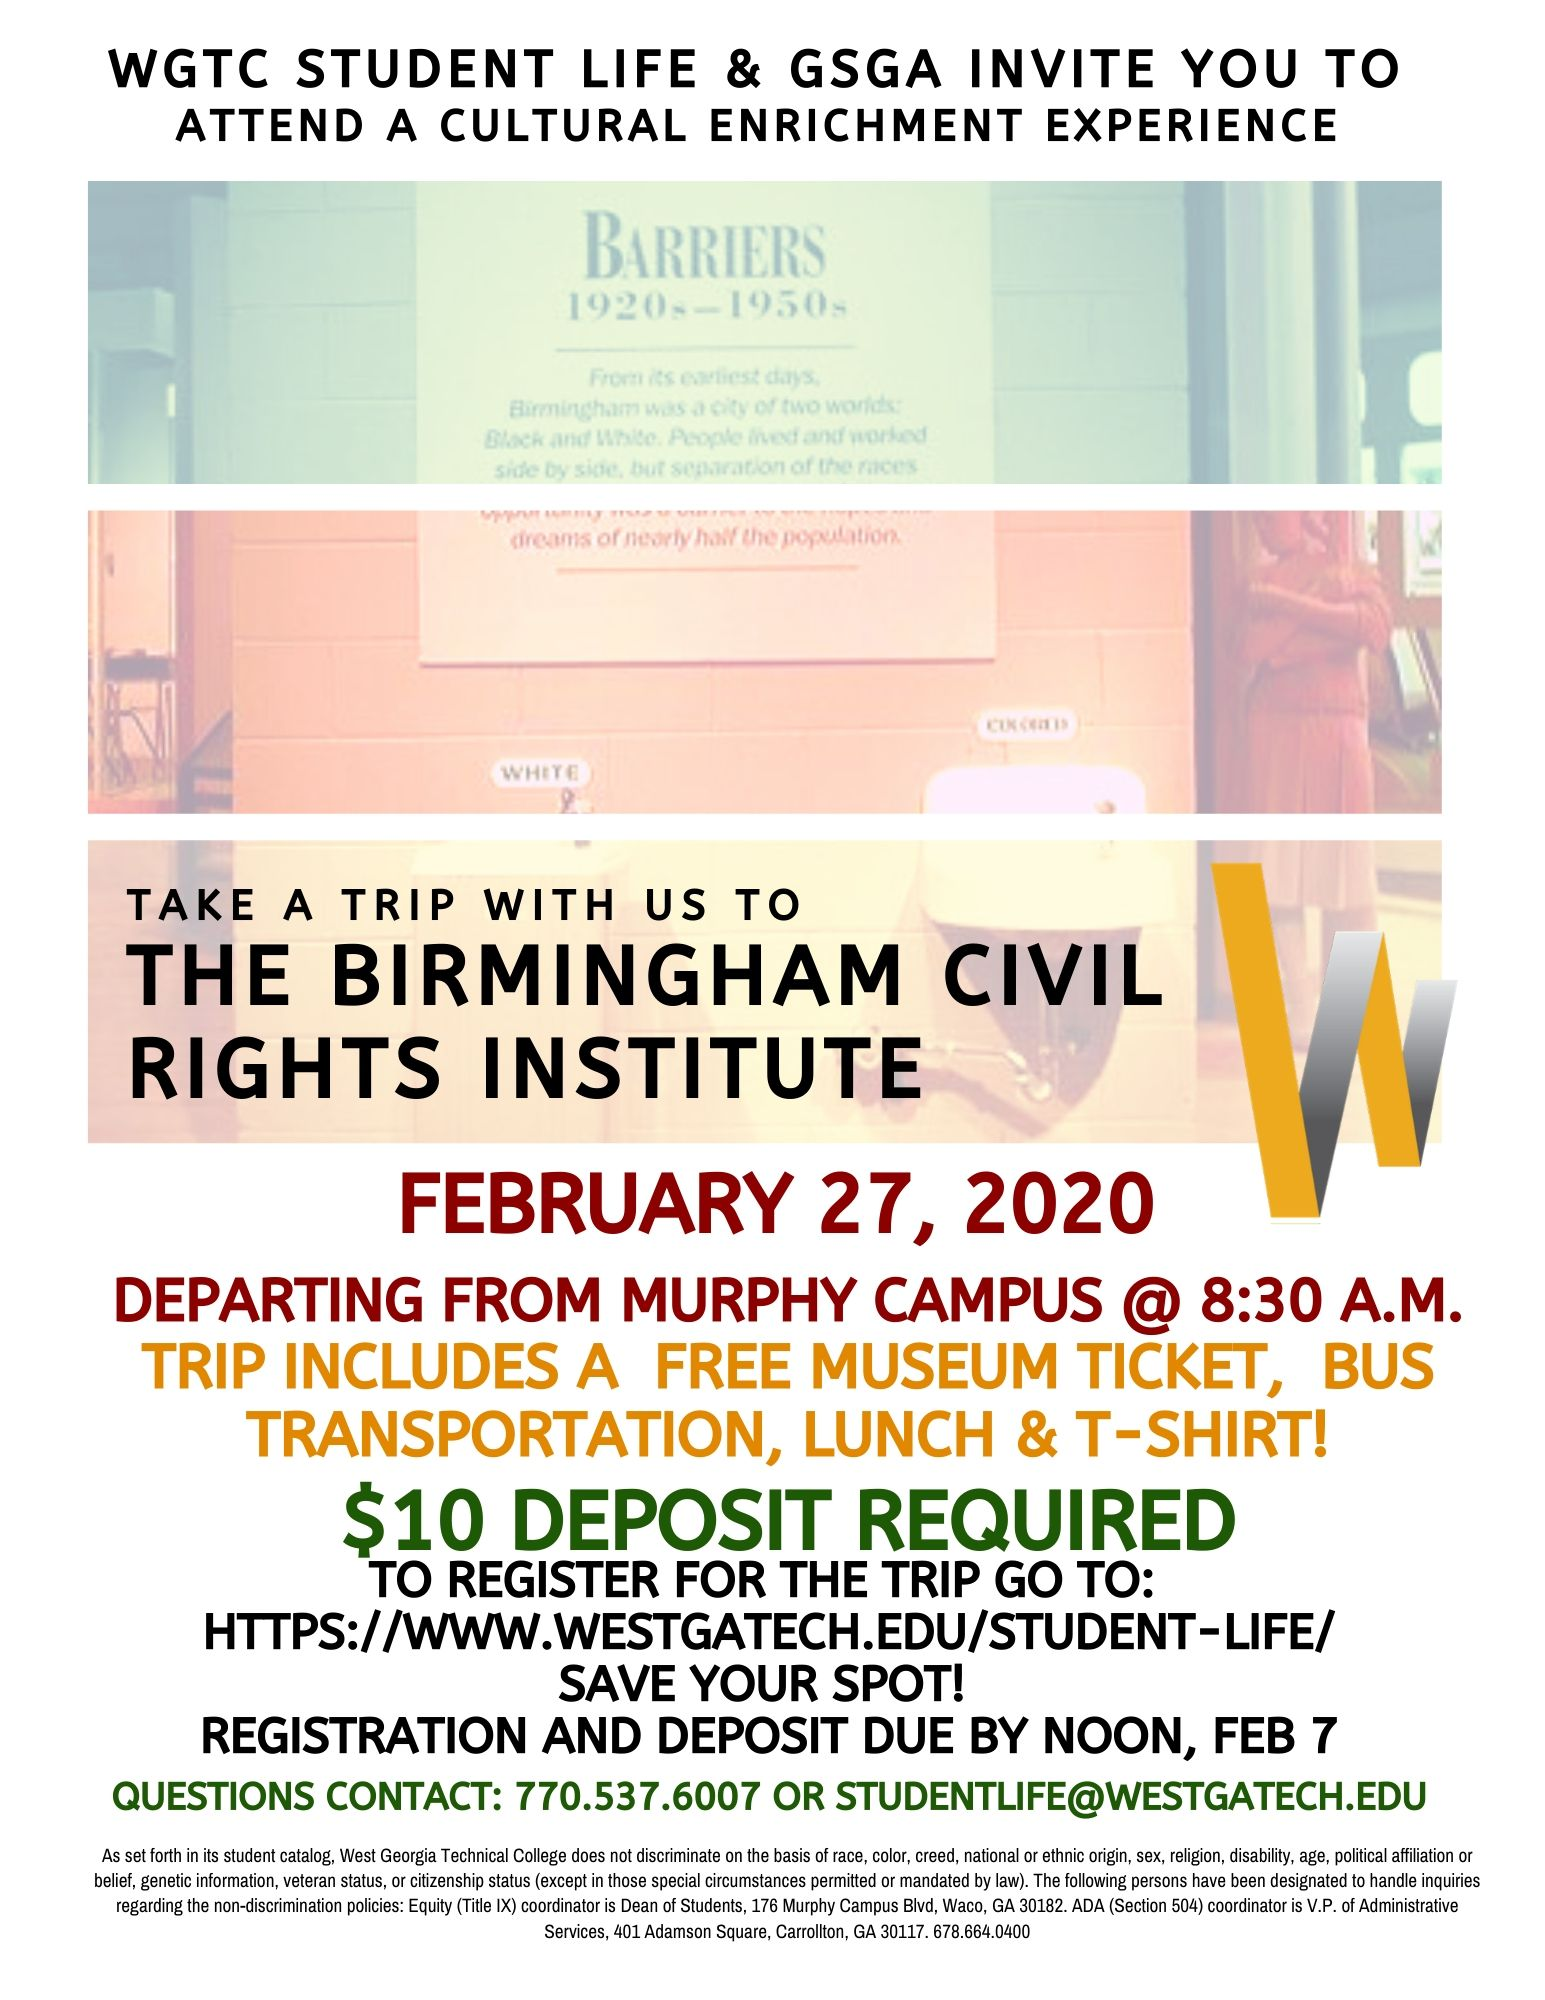 Birmingham civil rights institute trip february 27 2020